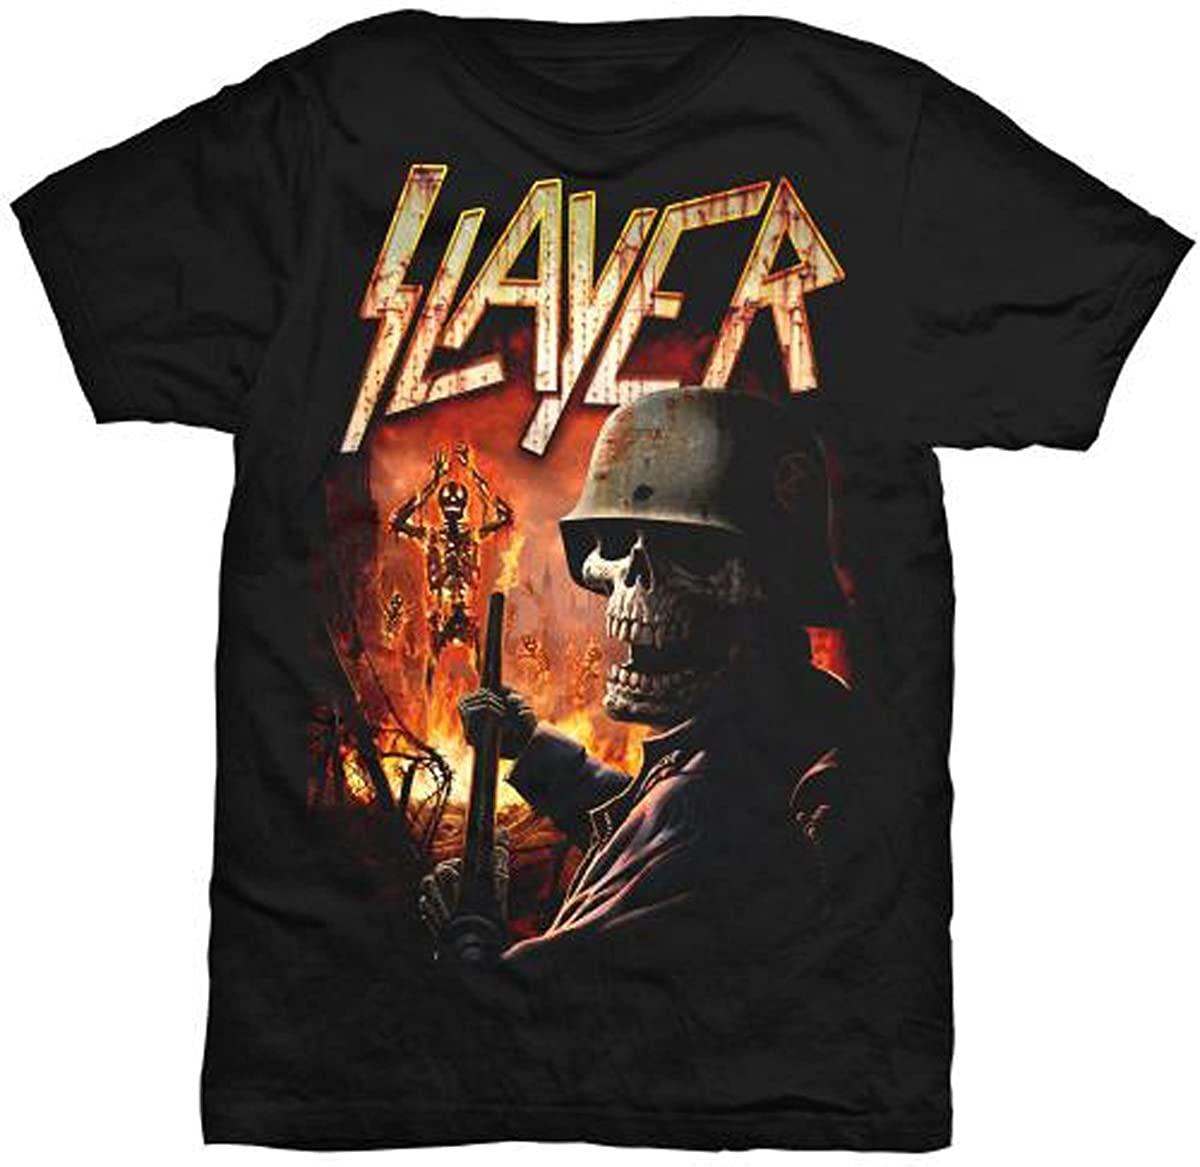 Slayer Mens Tee: Torch - Black - Large